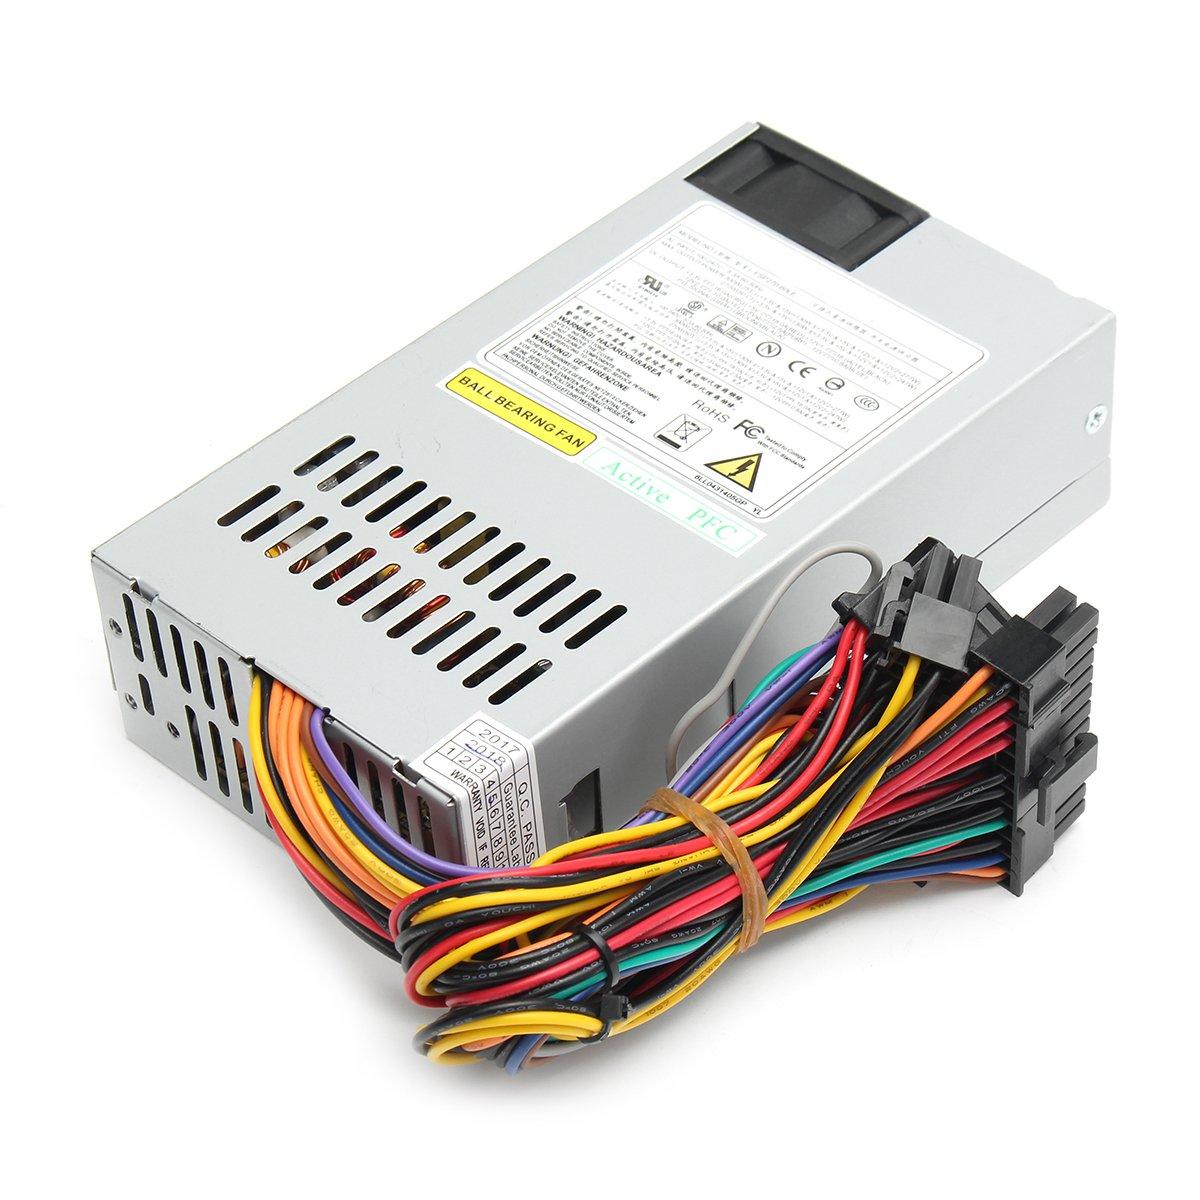 Original FSP270 270W Mini ITX Computer case flex for HTPC Small 1U NAS Power supply 100- 240V AC computer case